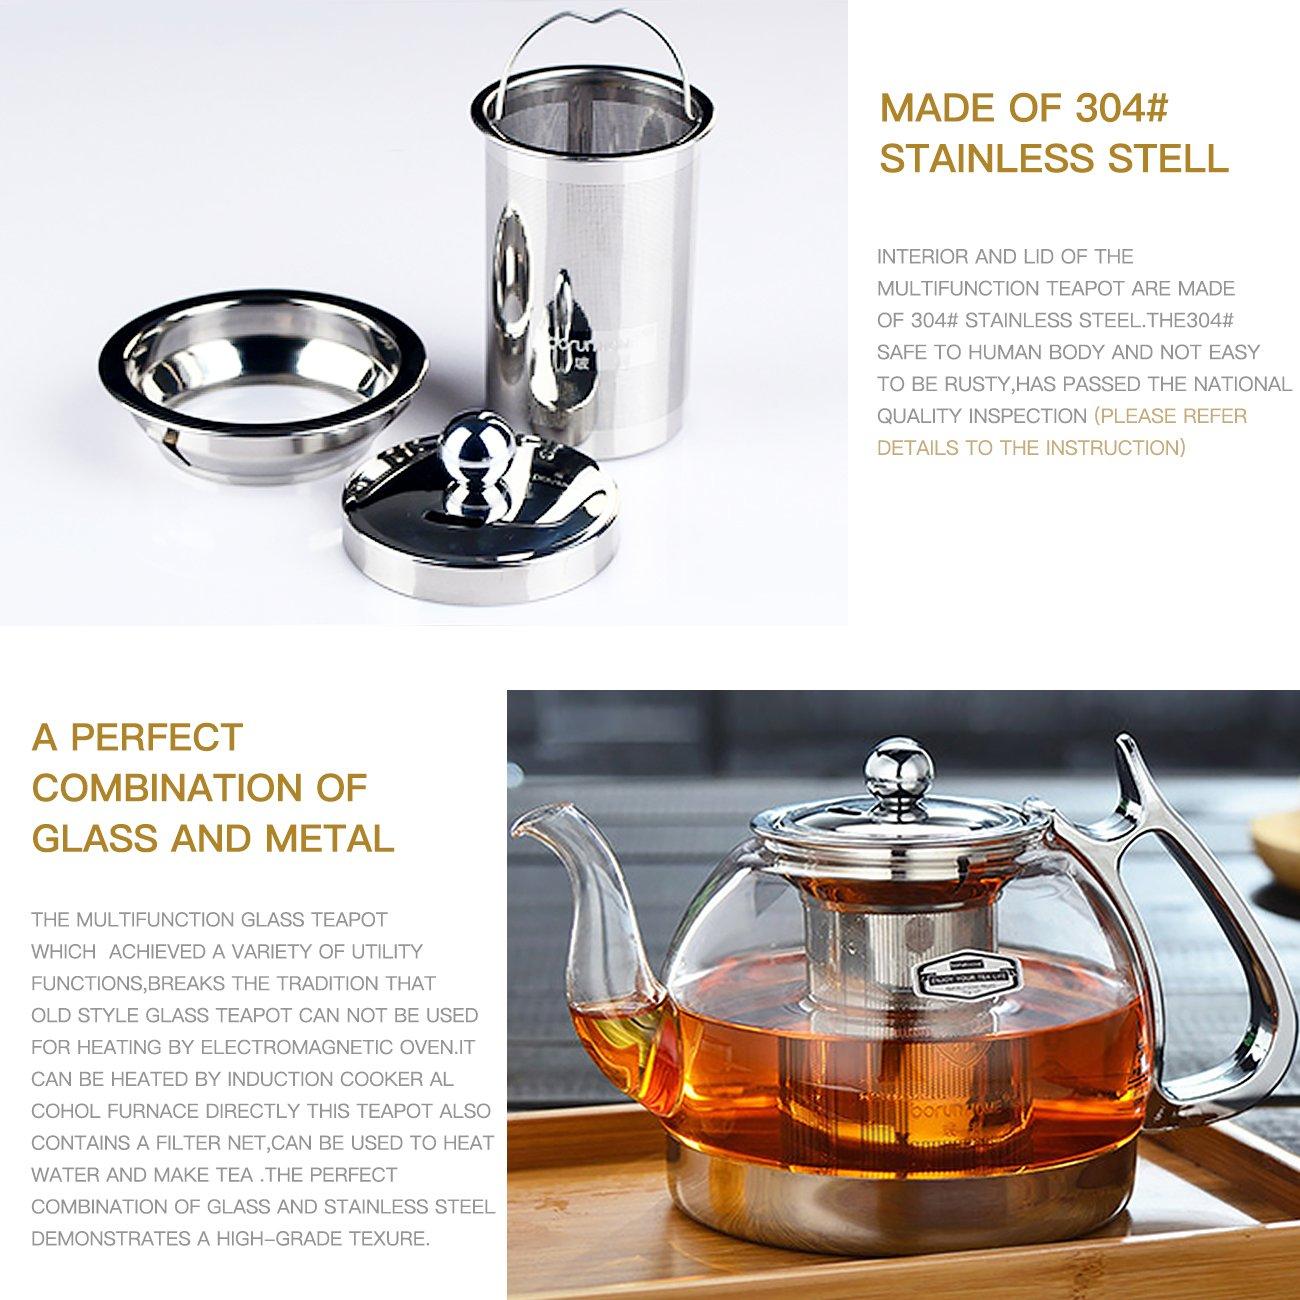 Taste Dish Coffee Mini Milk Pan Glass Wooden Handle Sauce Vinegar Plate Milk Pan Balems Multi-functional Milk Pan with Handle